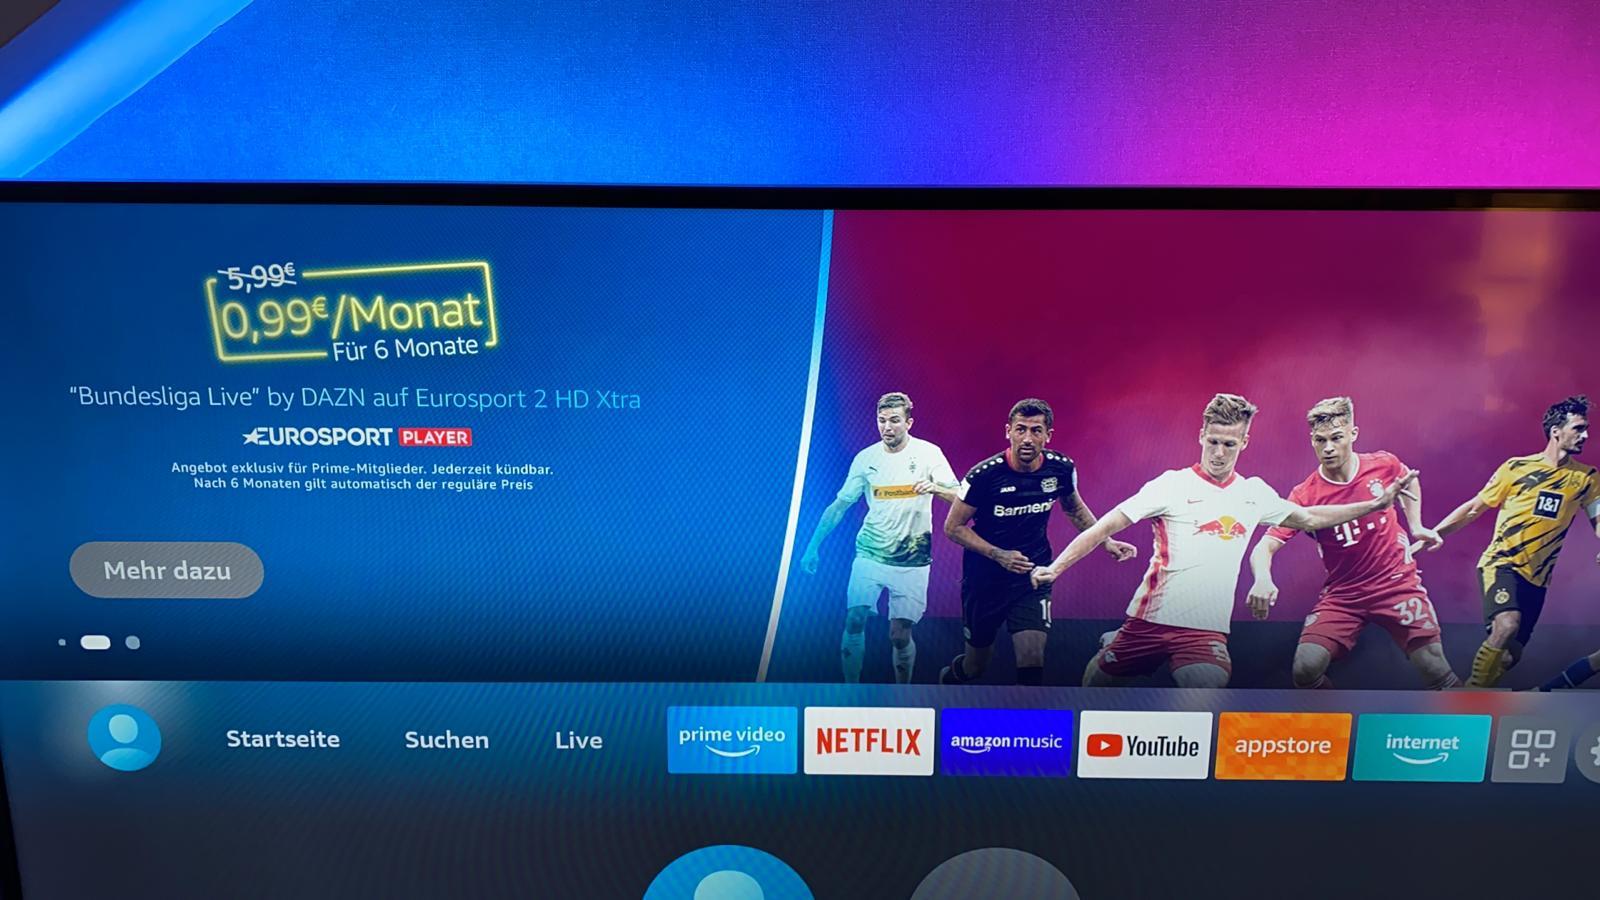 "[Amazon] Eurosport Player Channel – ""Bundesliga LIVE"" by DAZN auf Eurosport 2 HD Xtra"